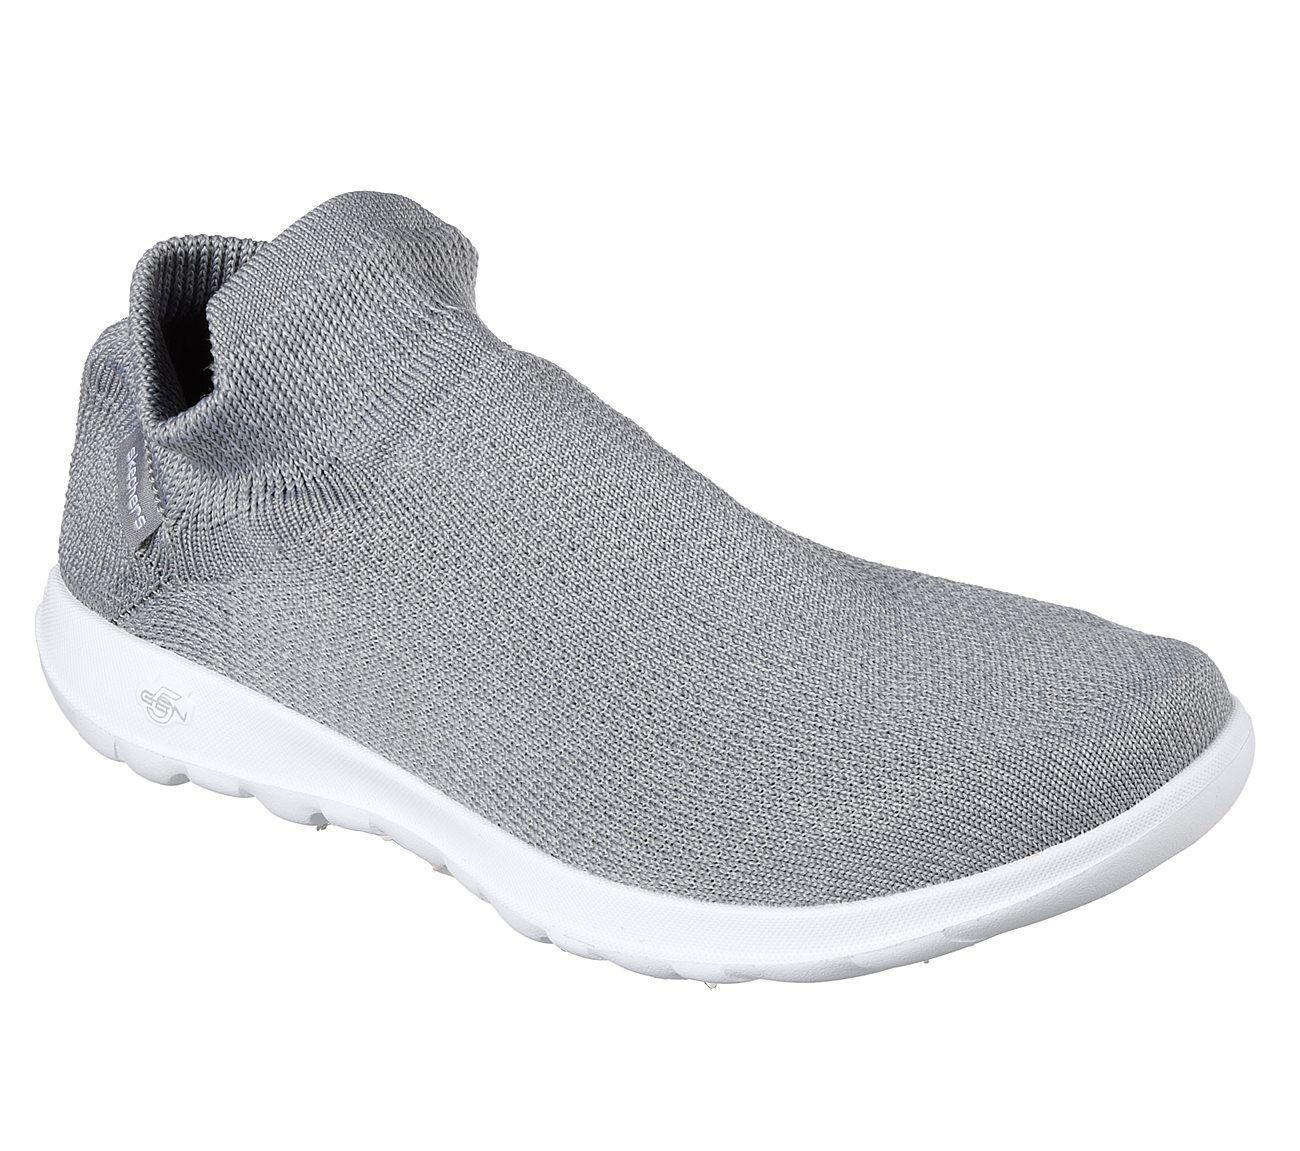 Details zu NEU SKECHERS Damen Fitness Sneakers GO WALK LITE BREAKOUT Grau